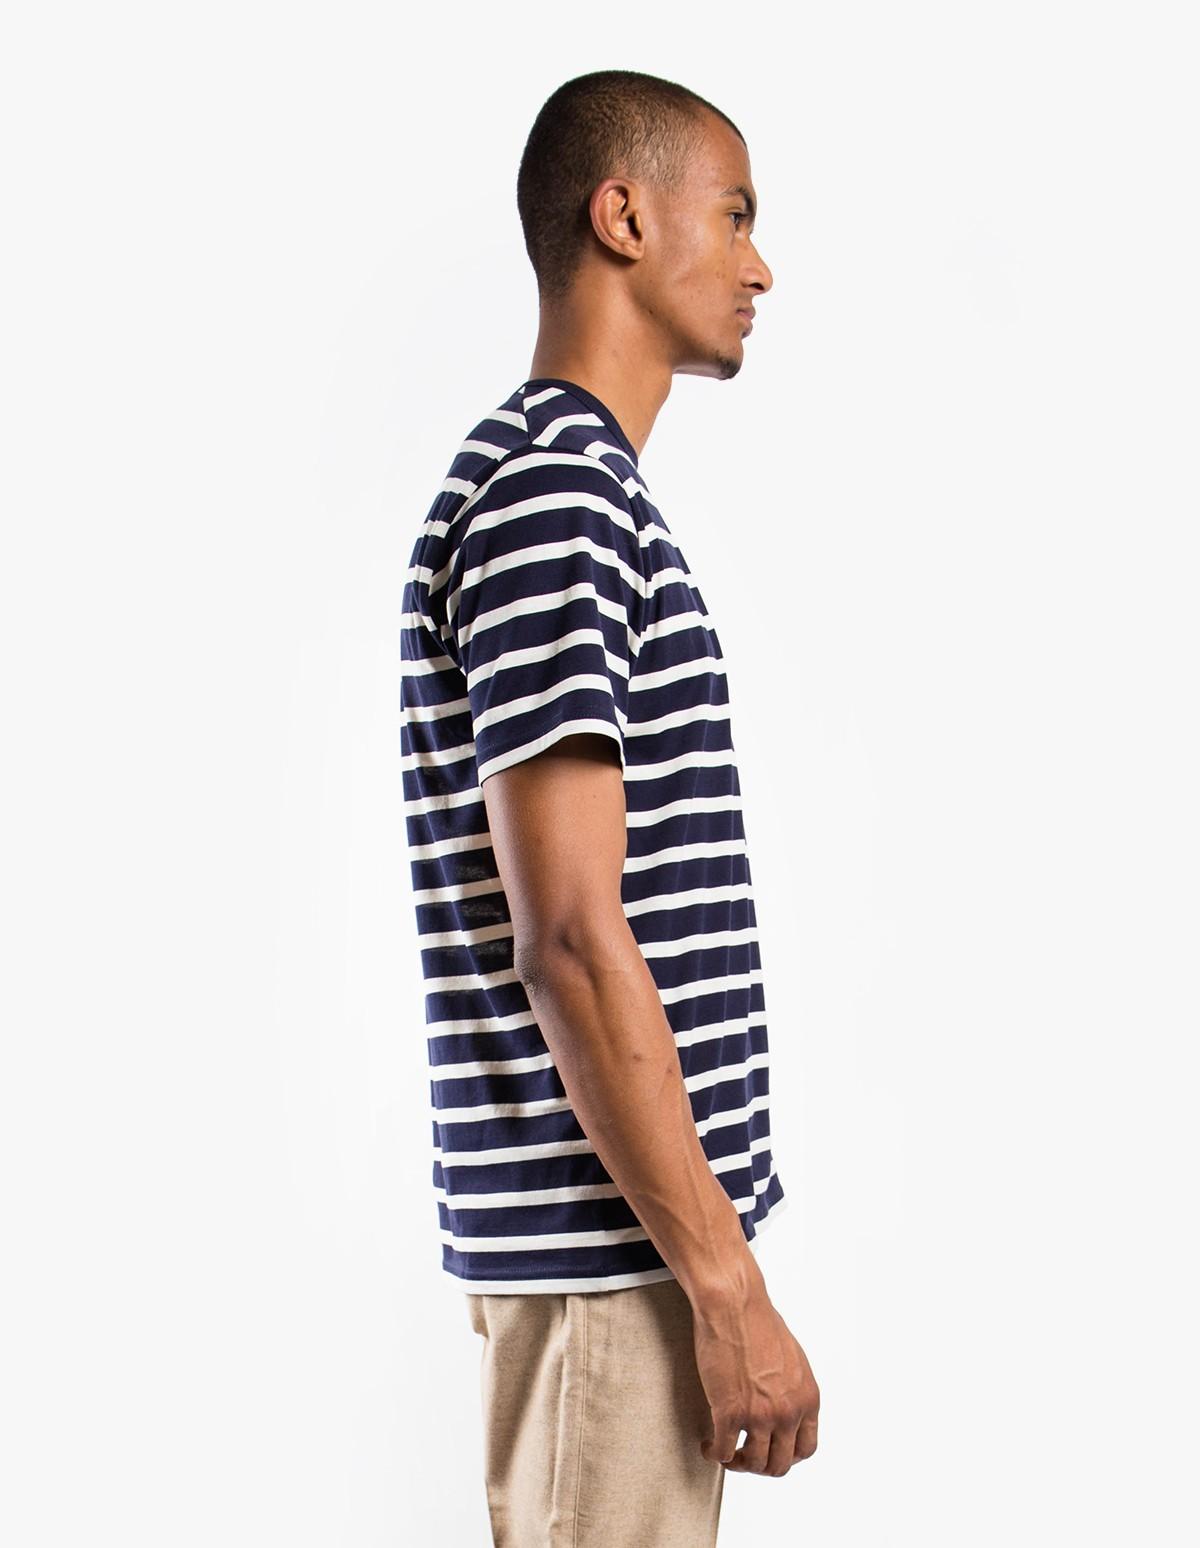 Sunspel Short Sleeve Striped Crew Neck T-Shirt  in Navy Ecru